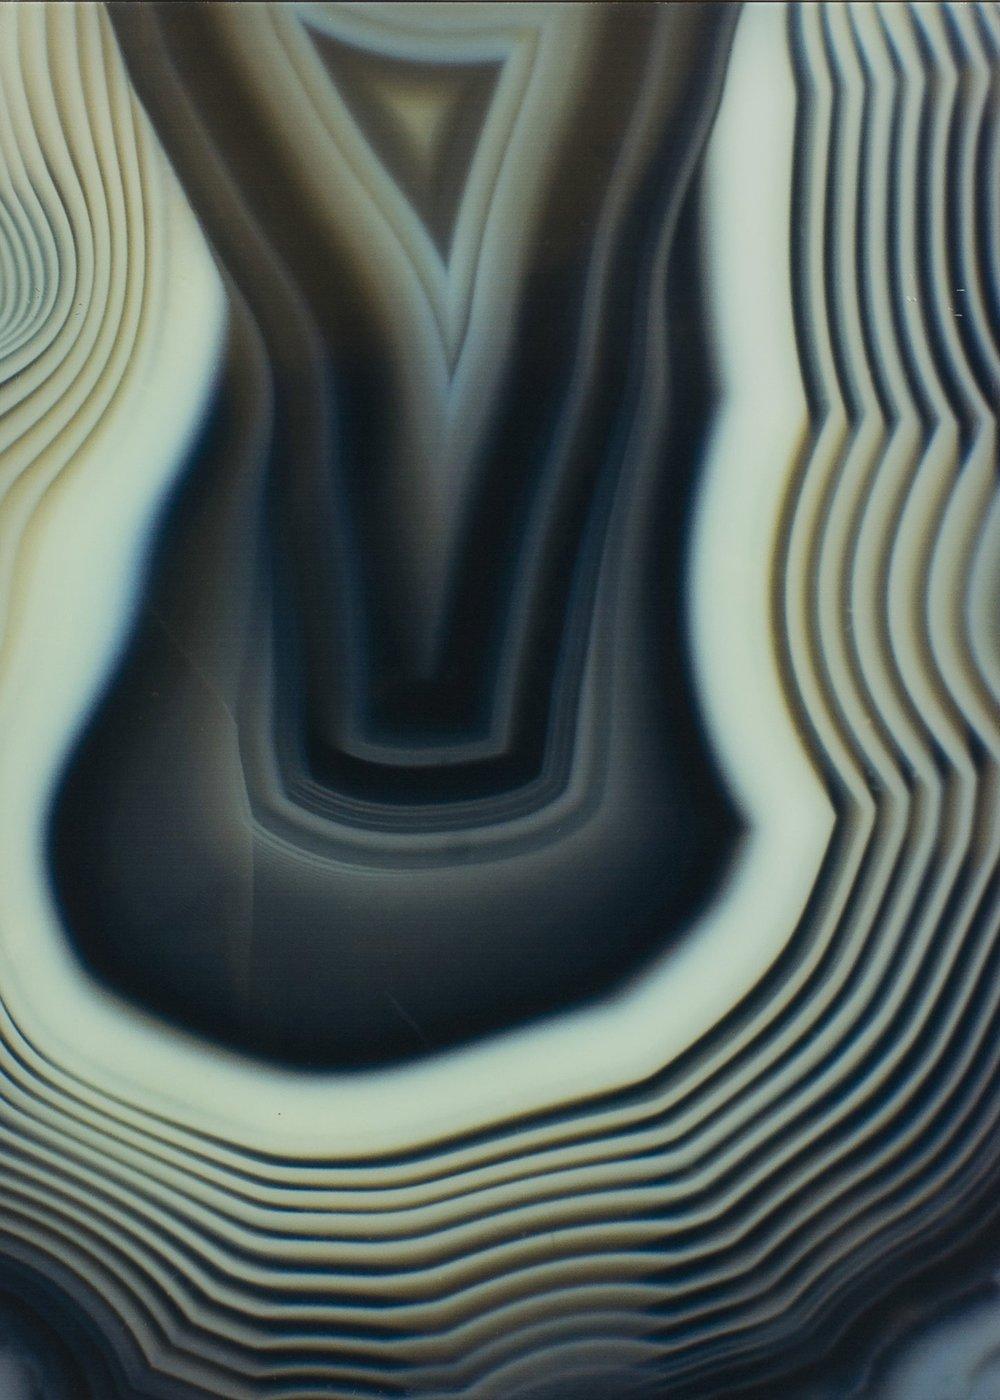 Serenity Geode Glass